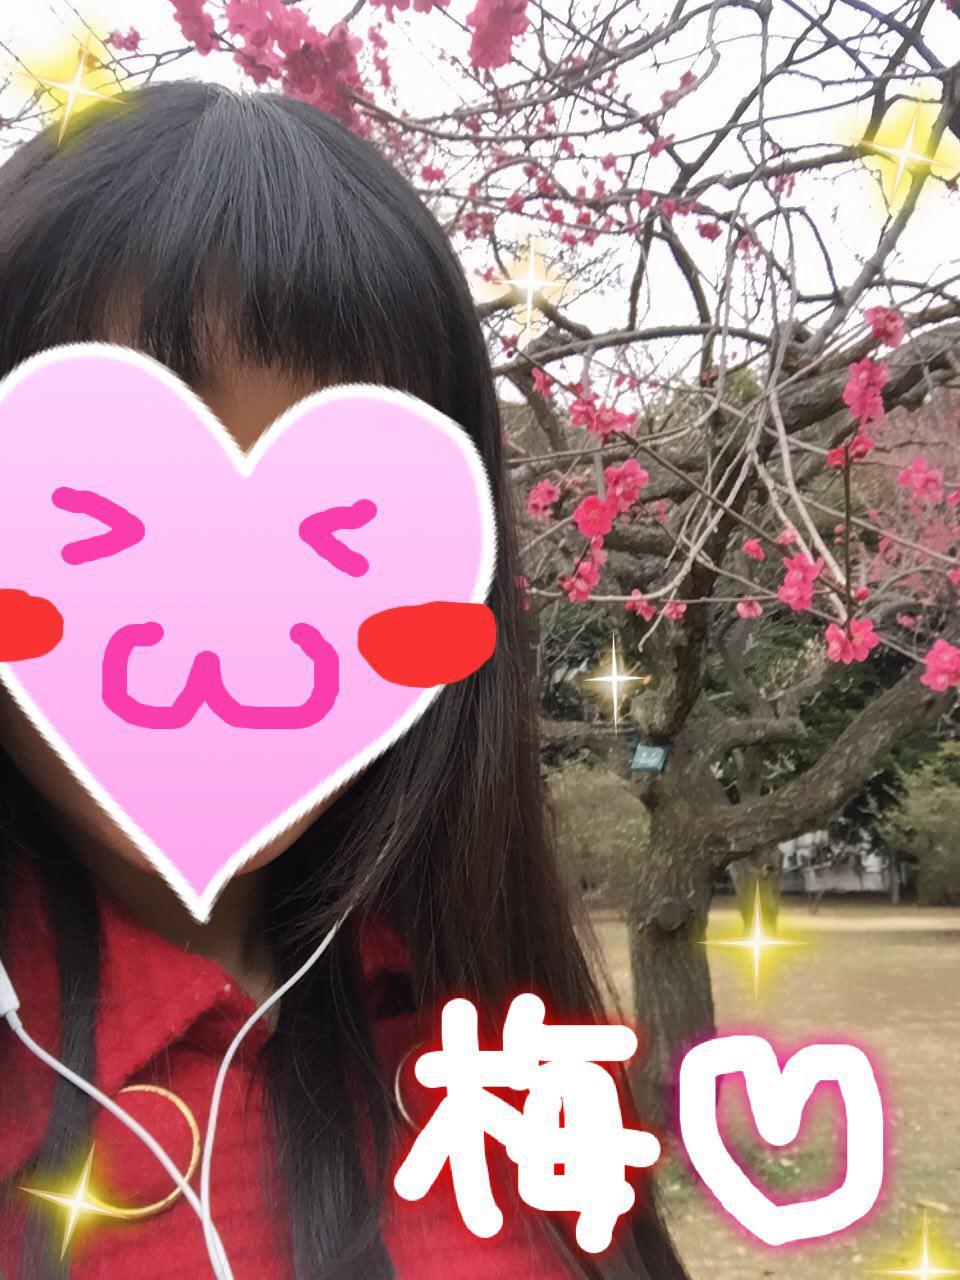 photo_2017-02-19_00-41-33.jpg